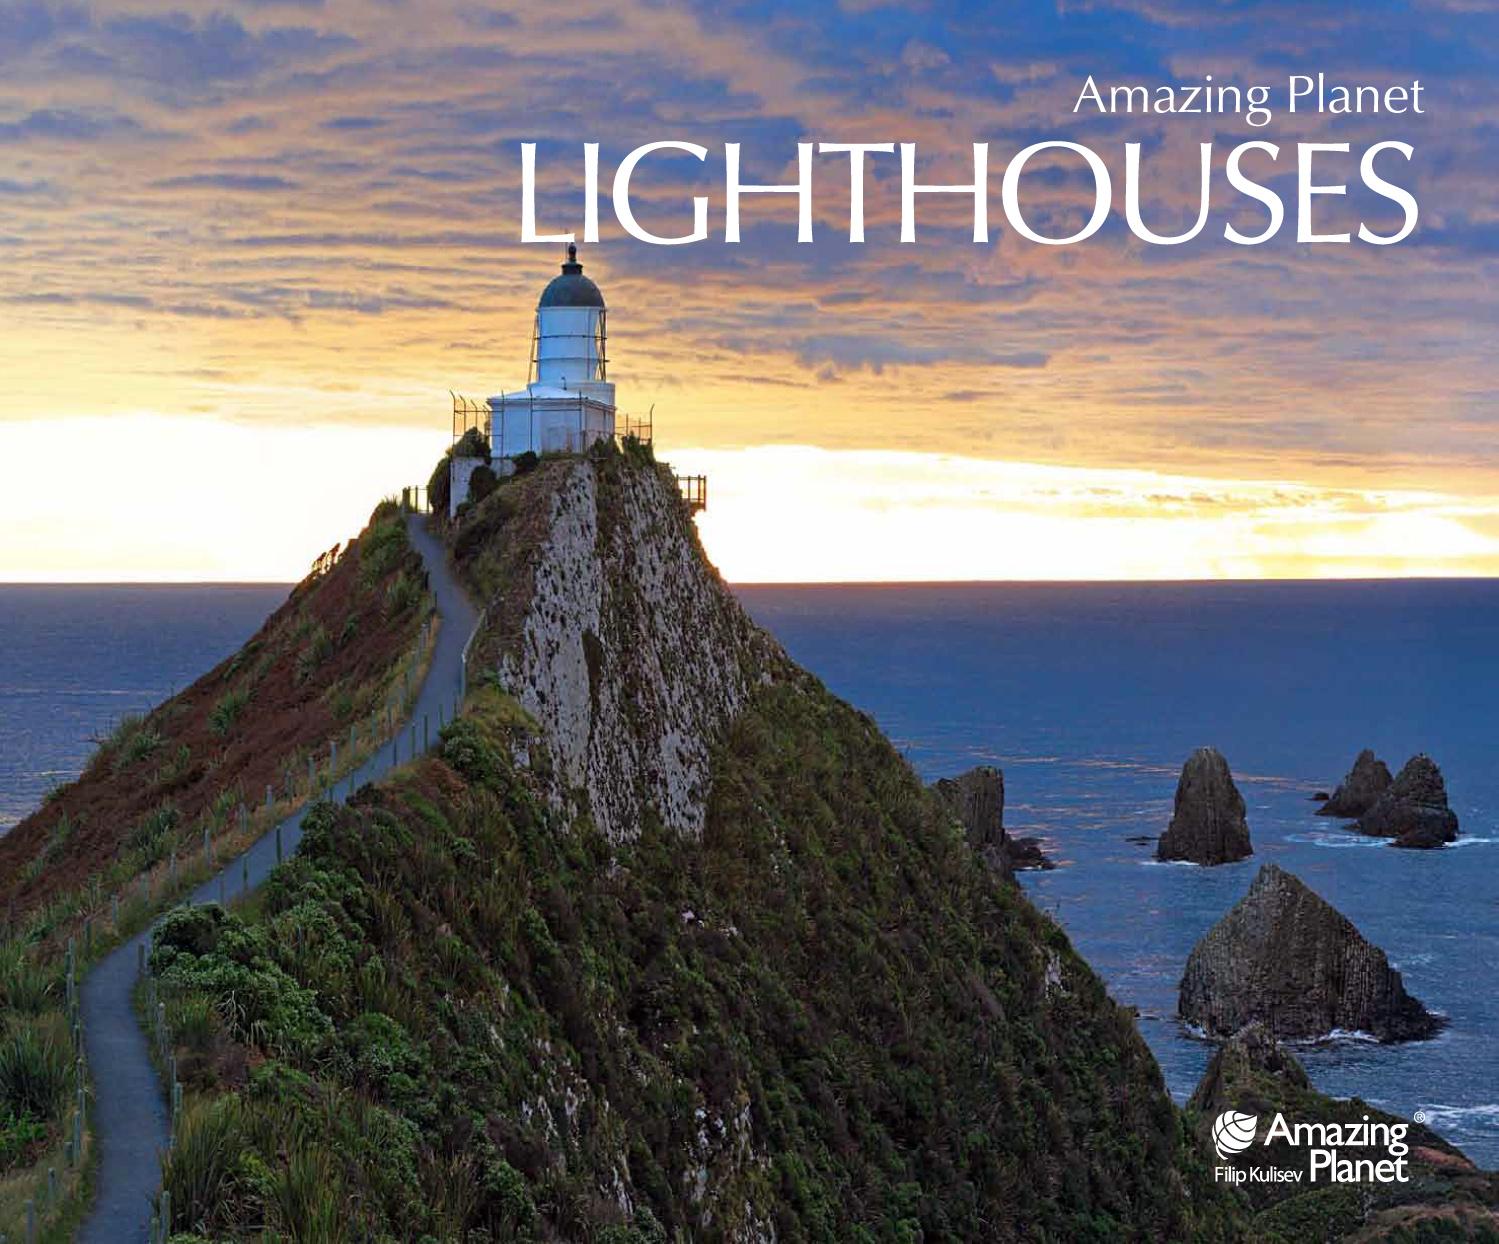 PP Lighthouses